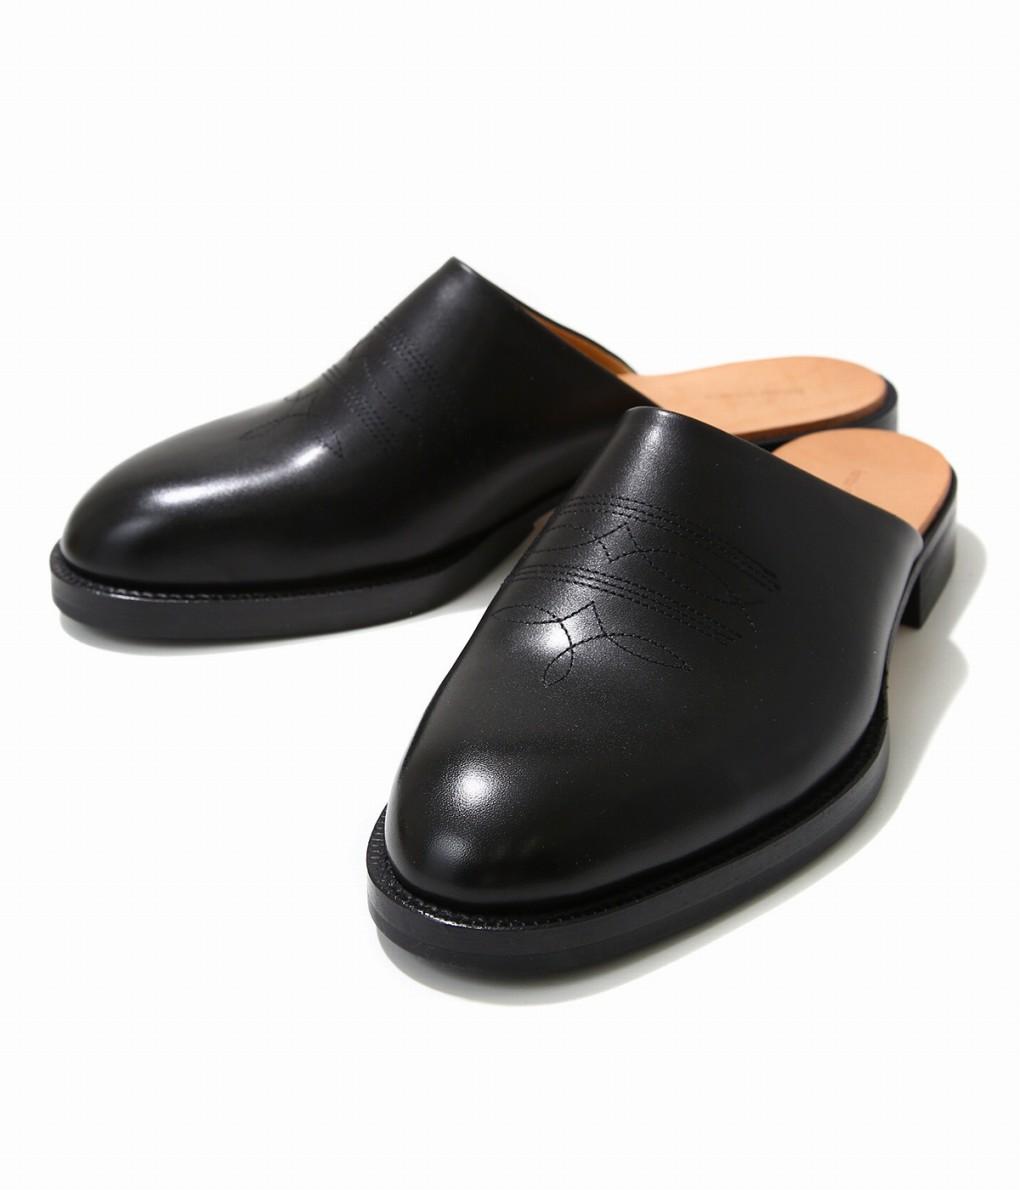 Hender Scheme / エンダースキーマ : cheak / 全3色 : エンダースキーマー チーク レザー 革 サンダル スリッパ 靴 シューズ メンズ : pm-rs-chk【RIP】【BJB】